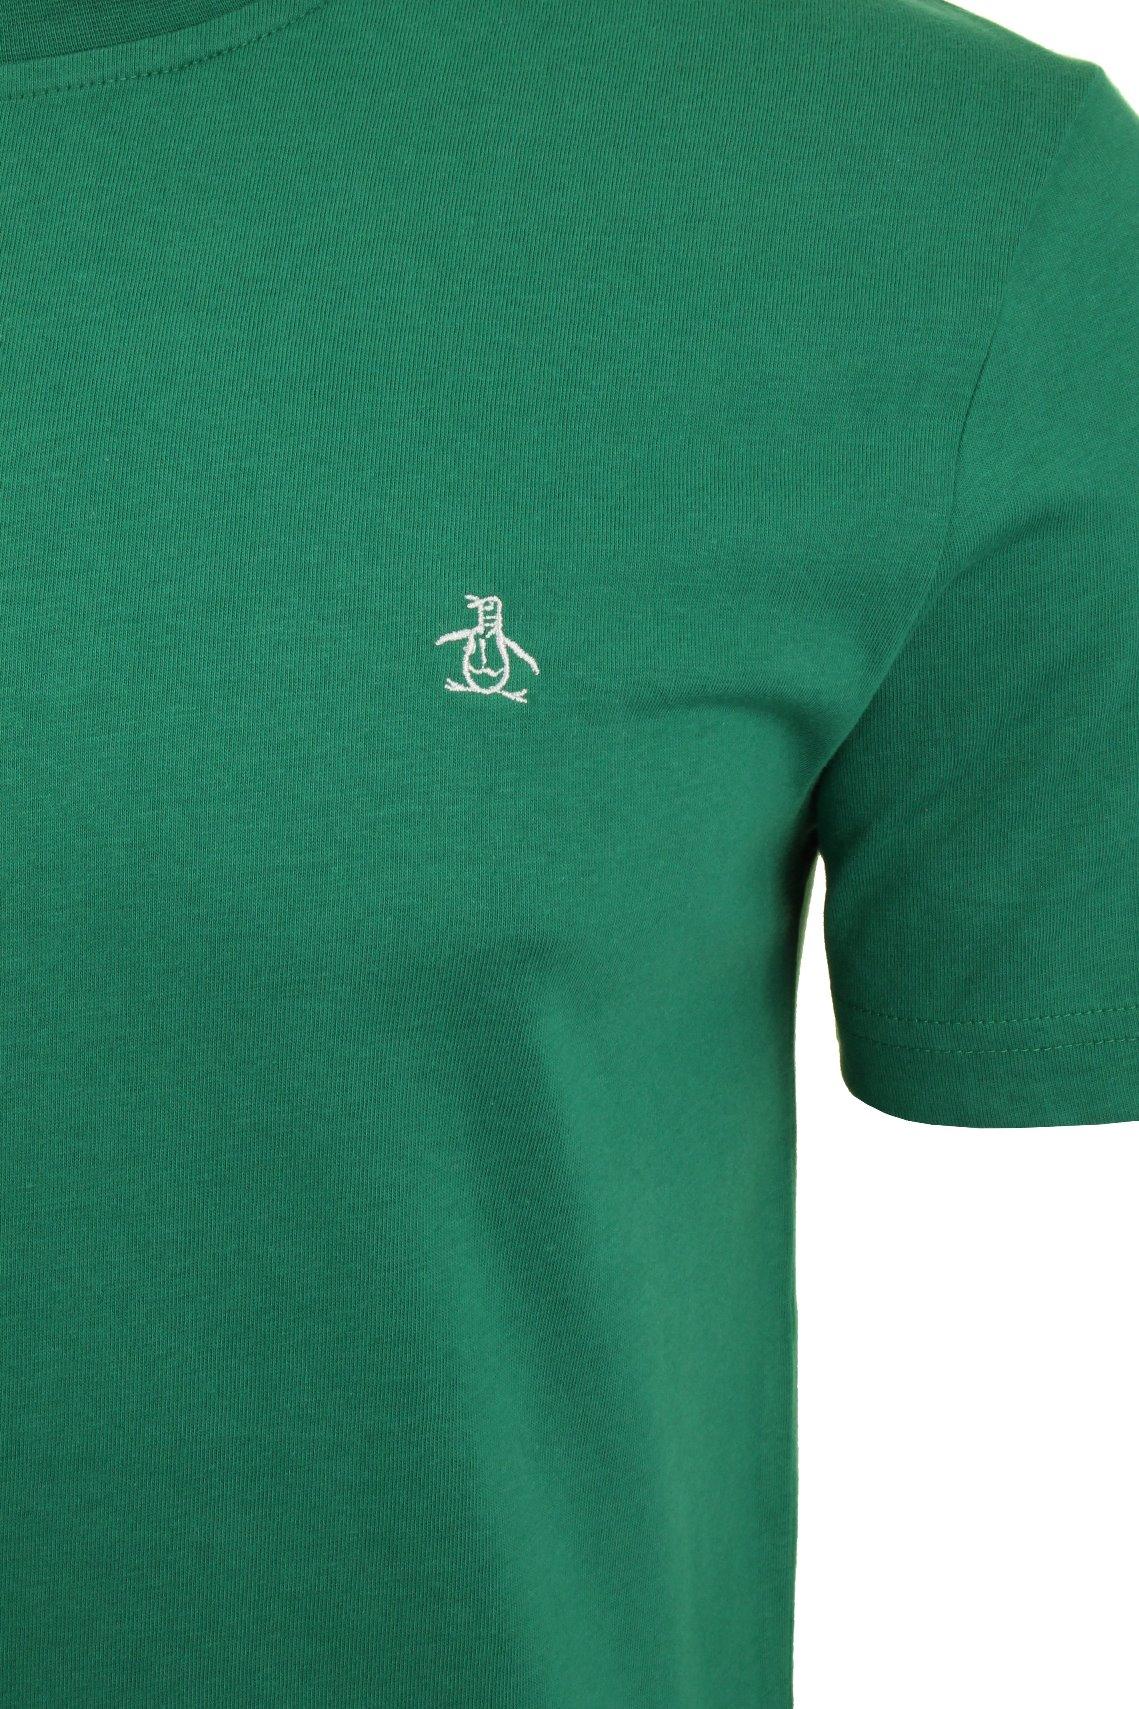 Mens-T-Shirt-by-Original-Penguin-Crew-Neck-Short-Sleeved thumbnail 43